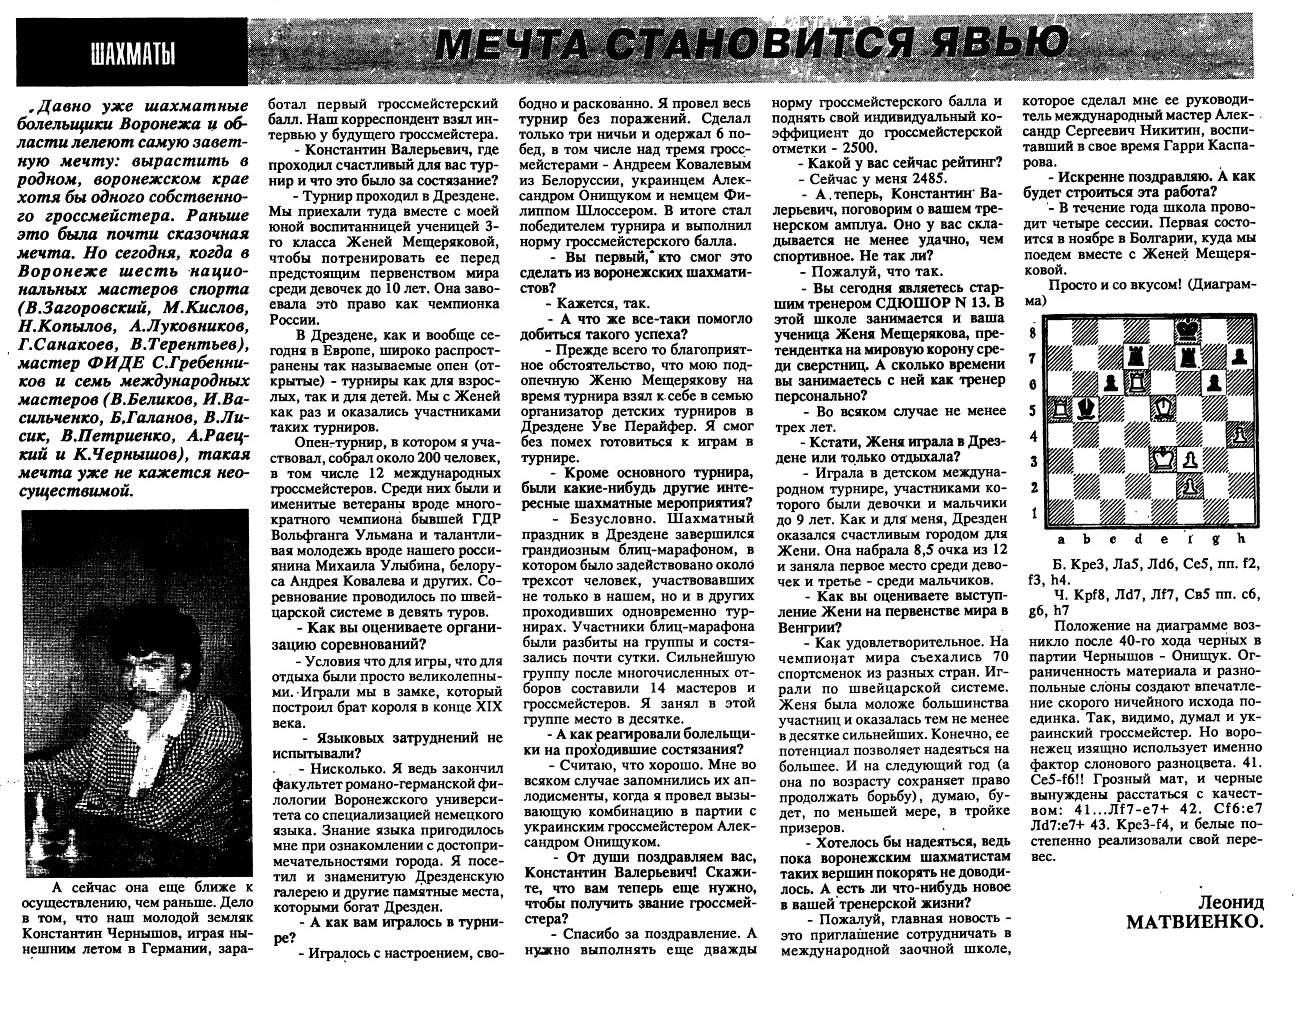 http://img-fotki.yandex.ru/get/25541/236155452.1/0_138ab5_559c1f2d_orig.jpg